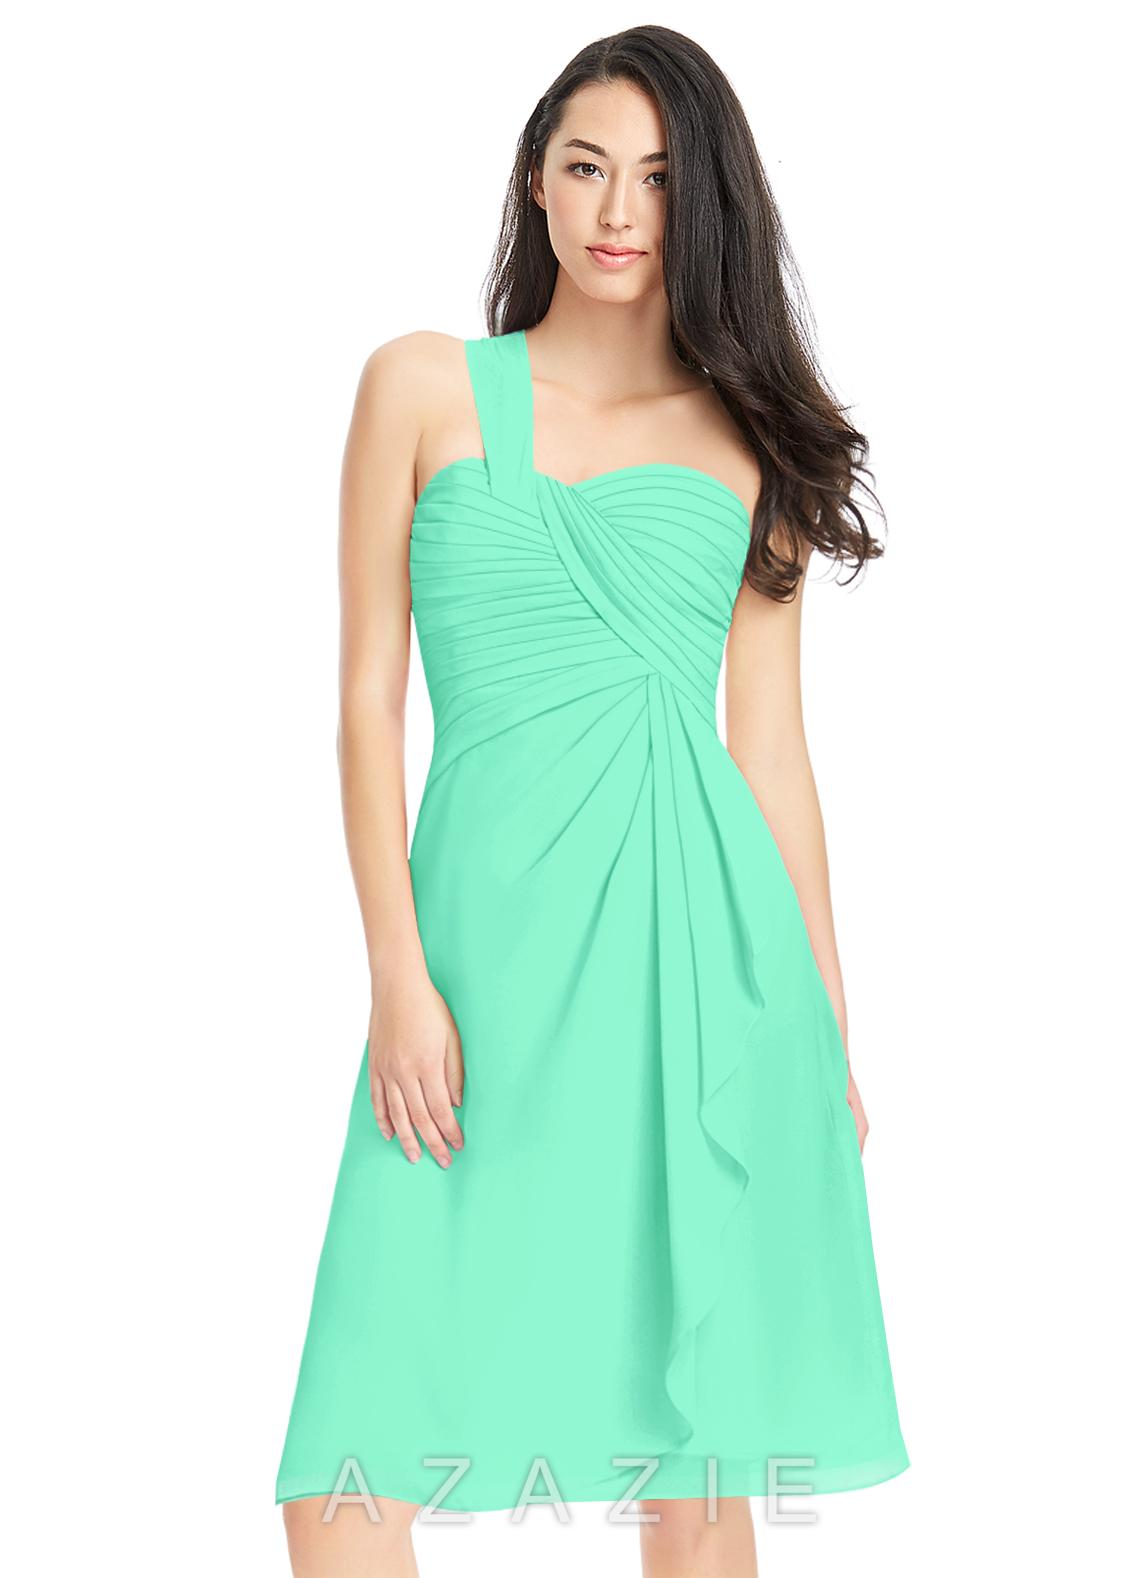 Azazie madalynn bridesmaid dress azazie loading zoom ombrellifo Choice Image